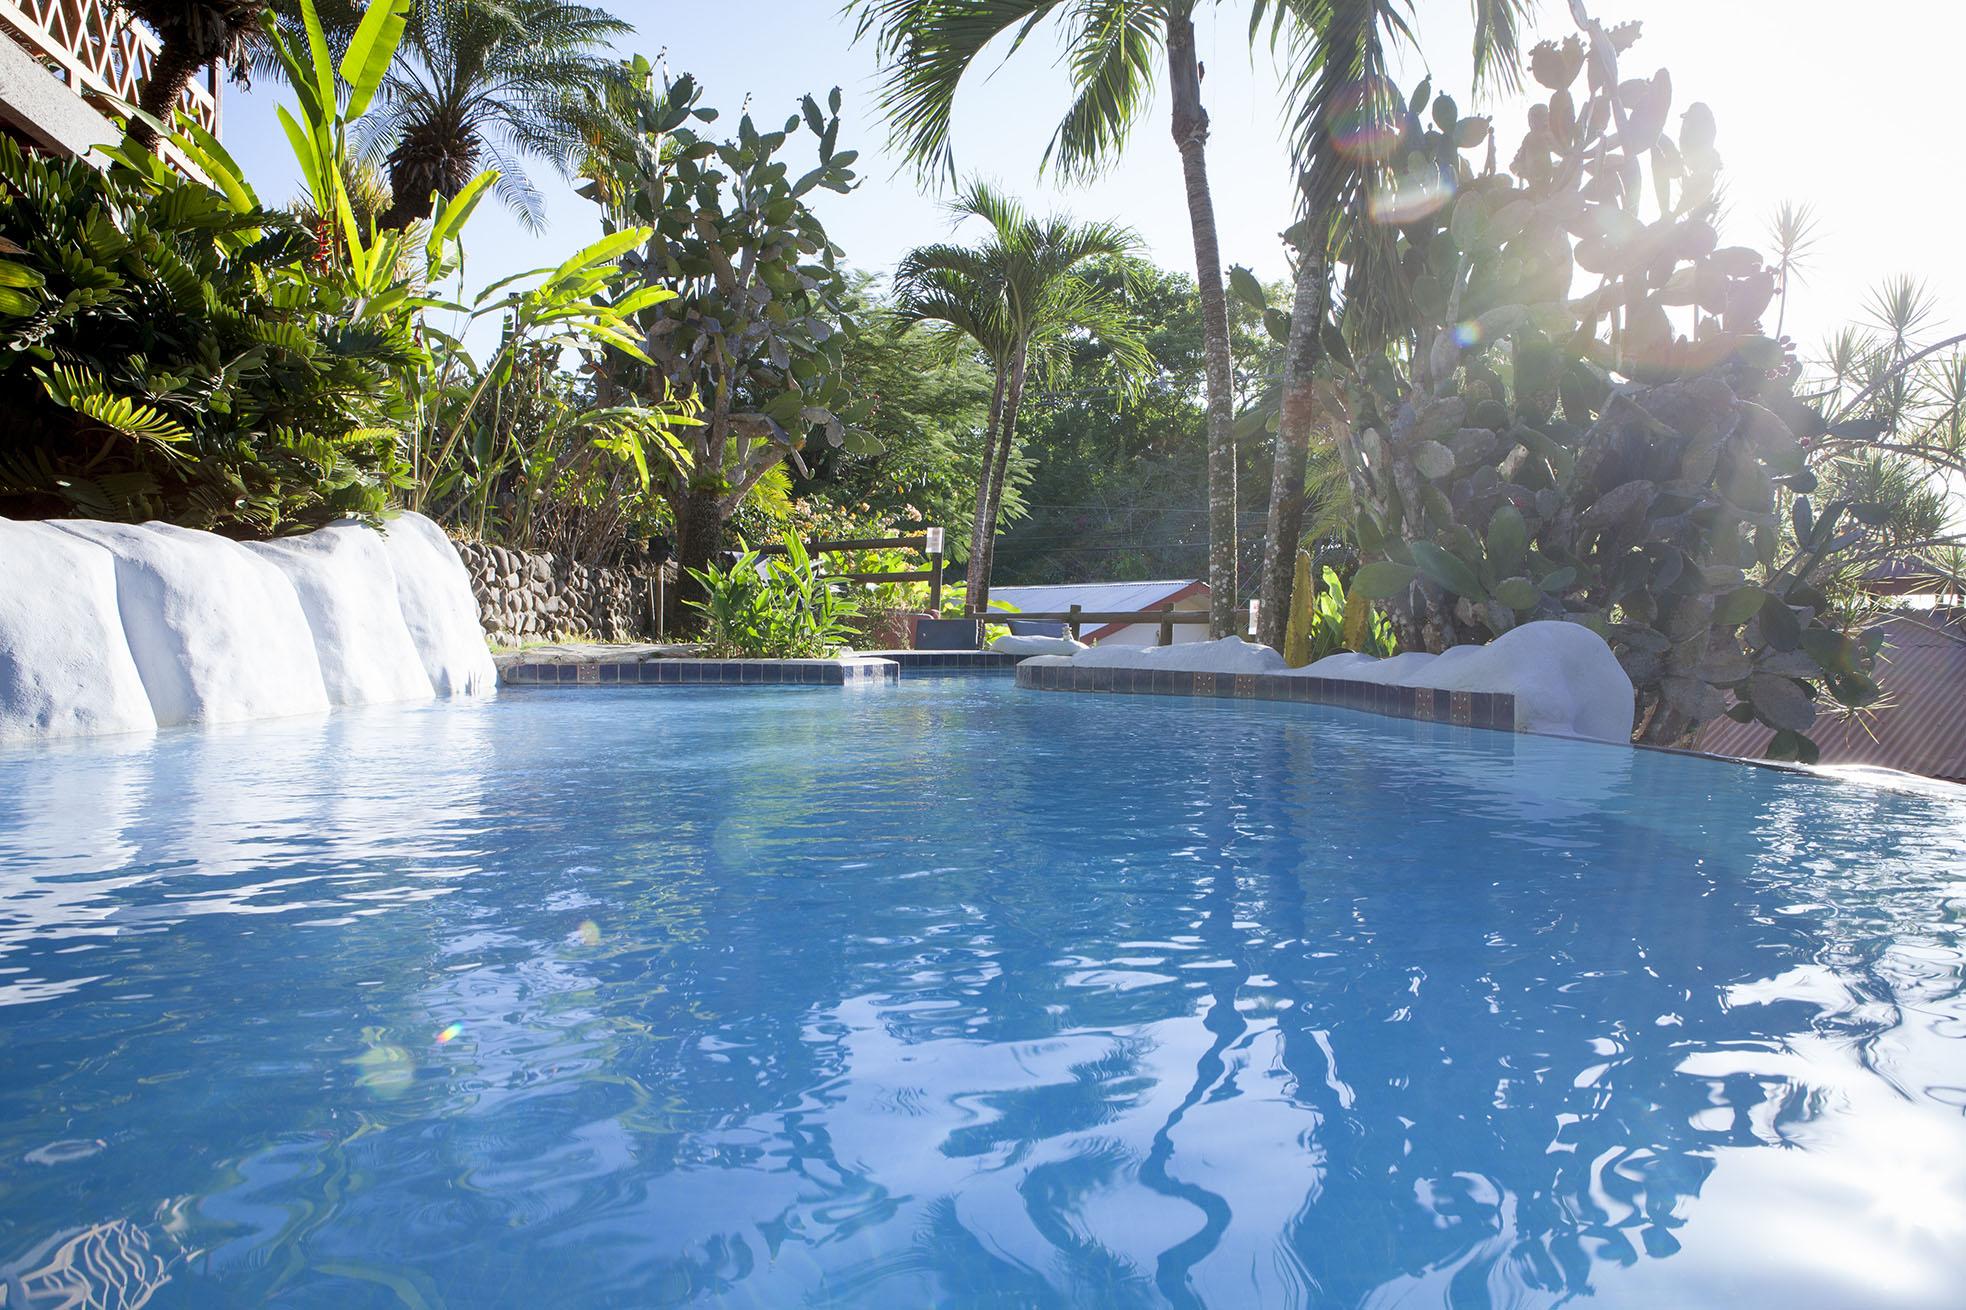 Hotel El Jardín Swimming Pool Jacuzzi